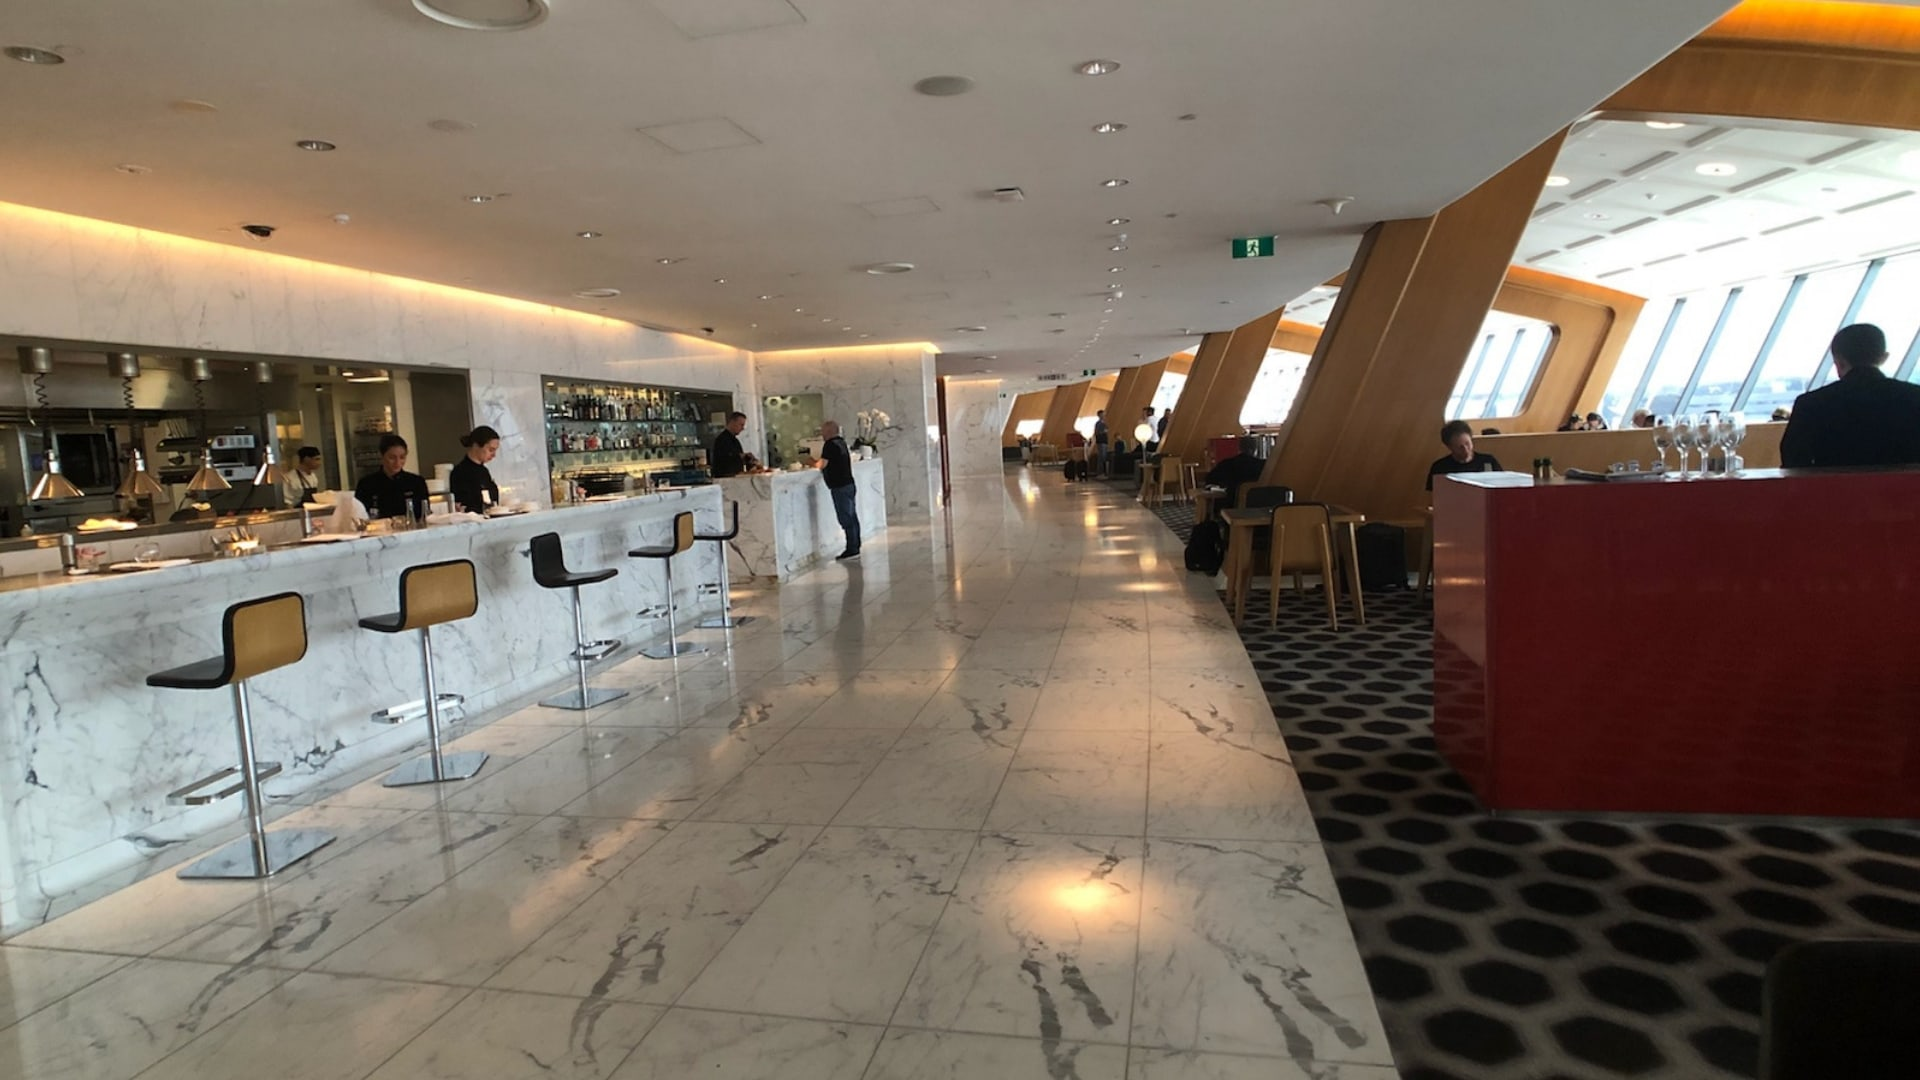 qantas first class lounge sydney bar two